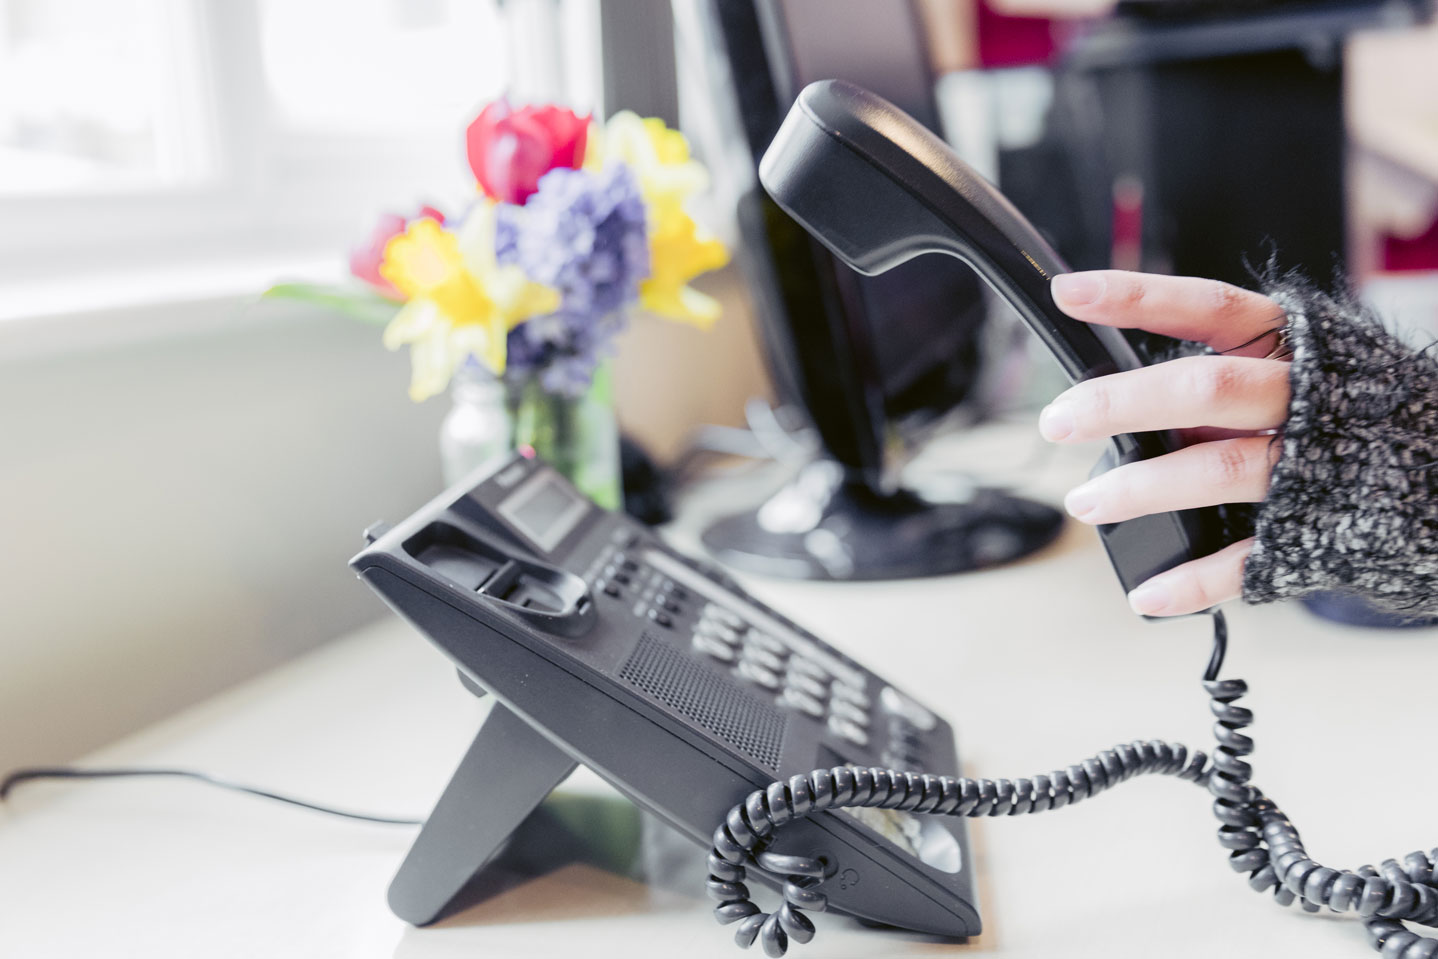 Services-helpline